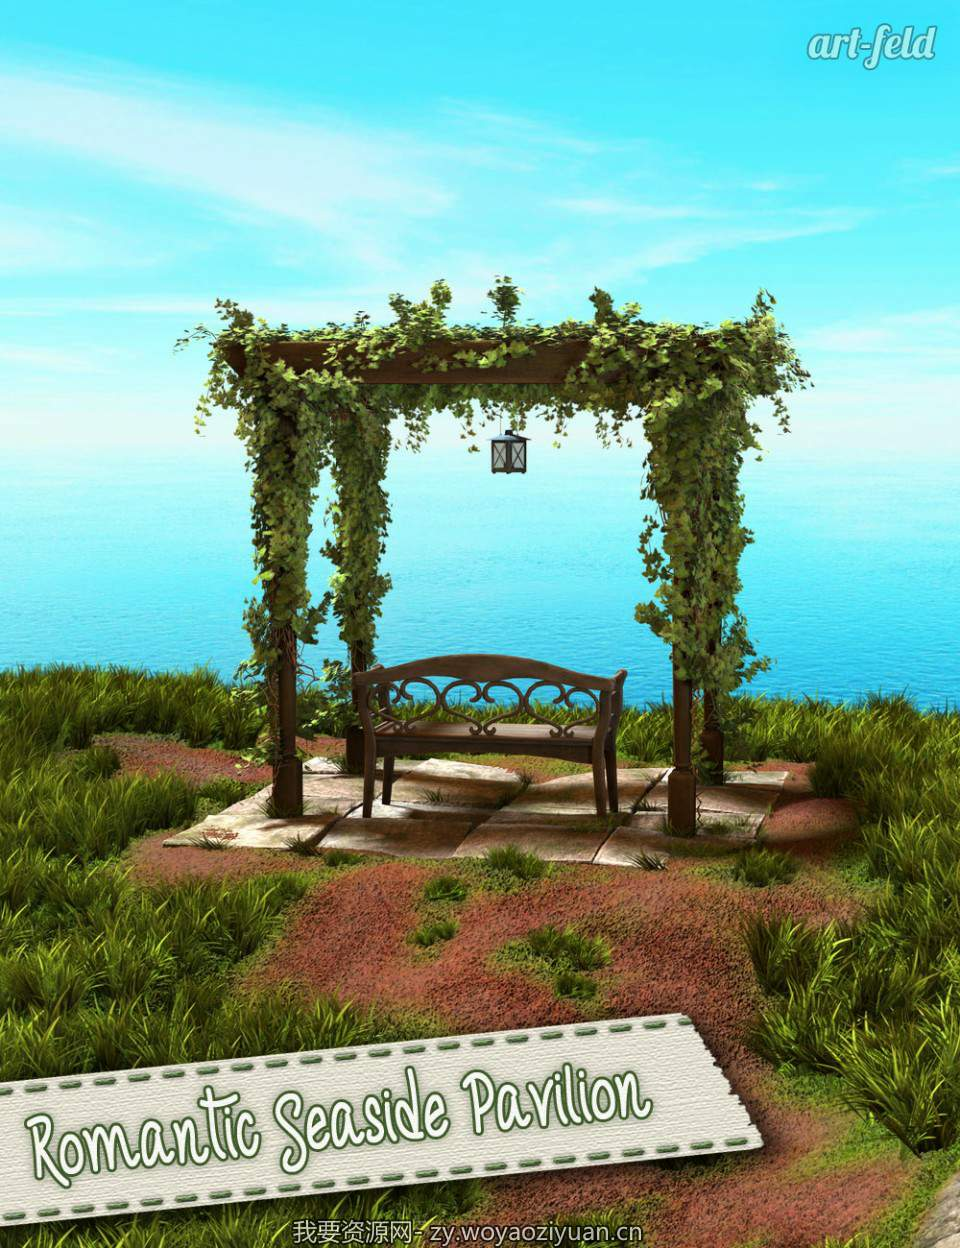 Romantic Seaside Pavilion